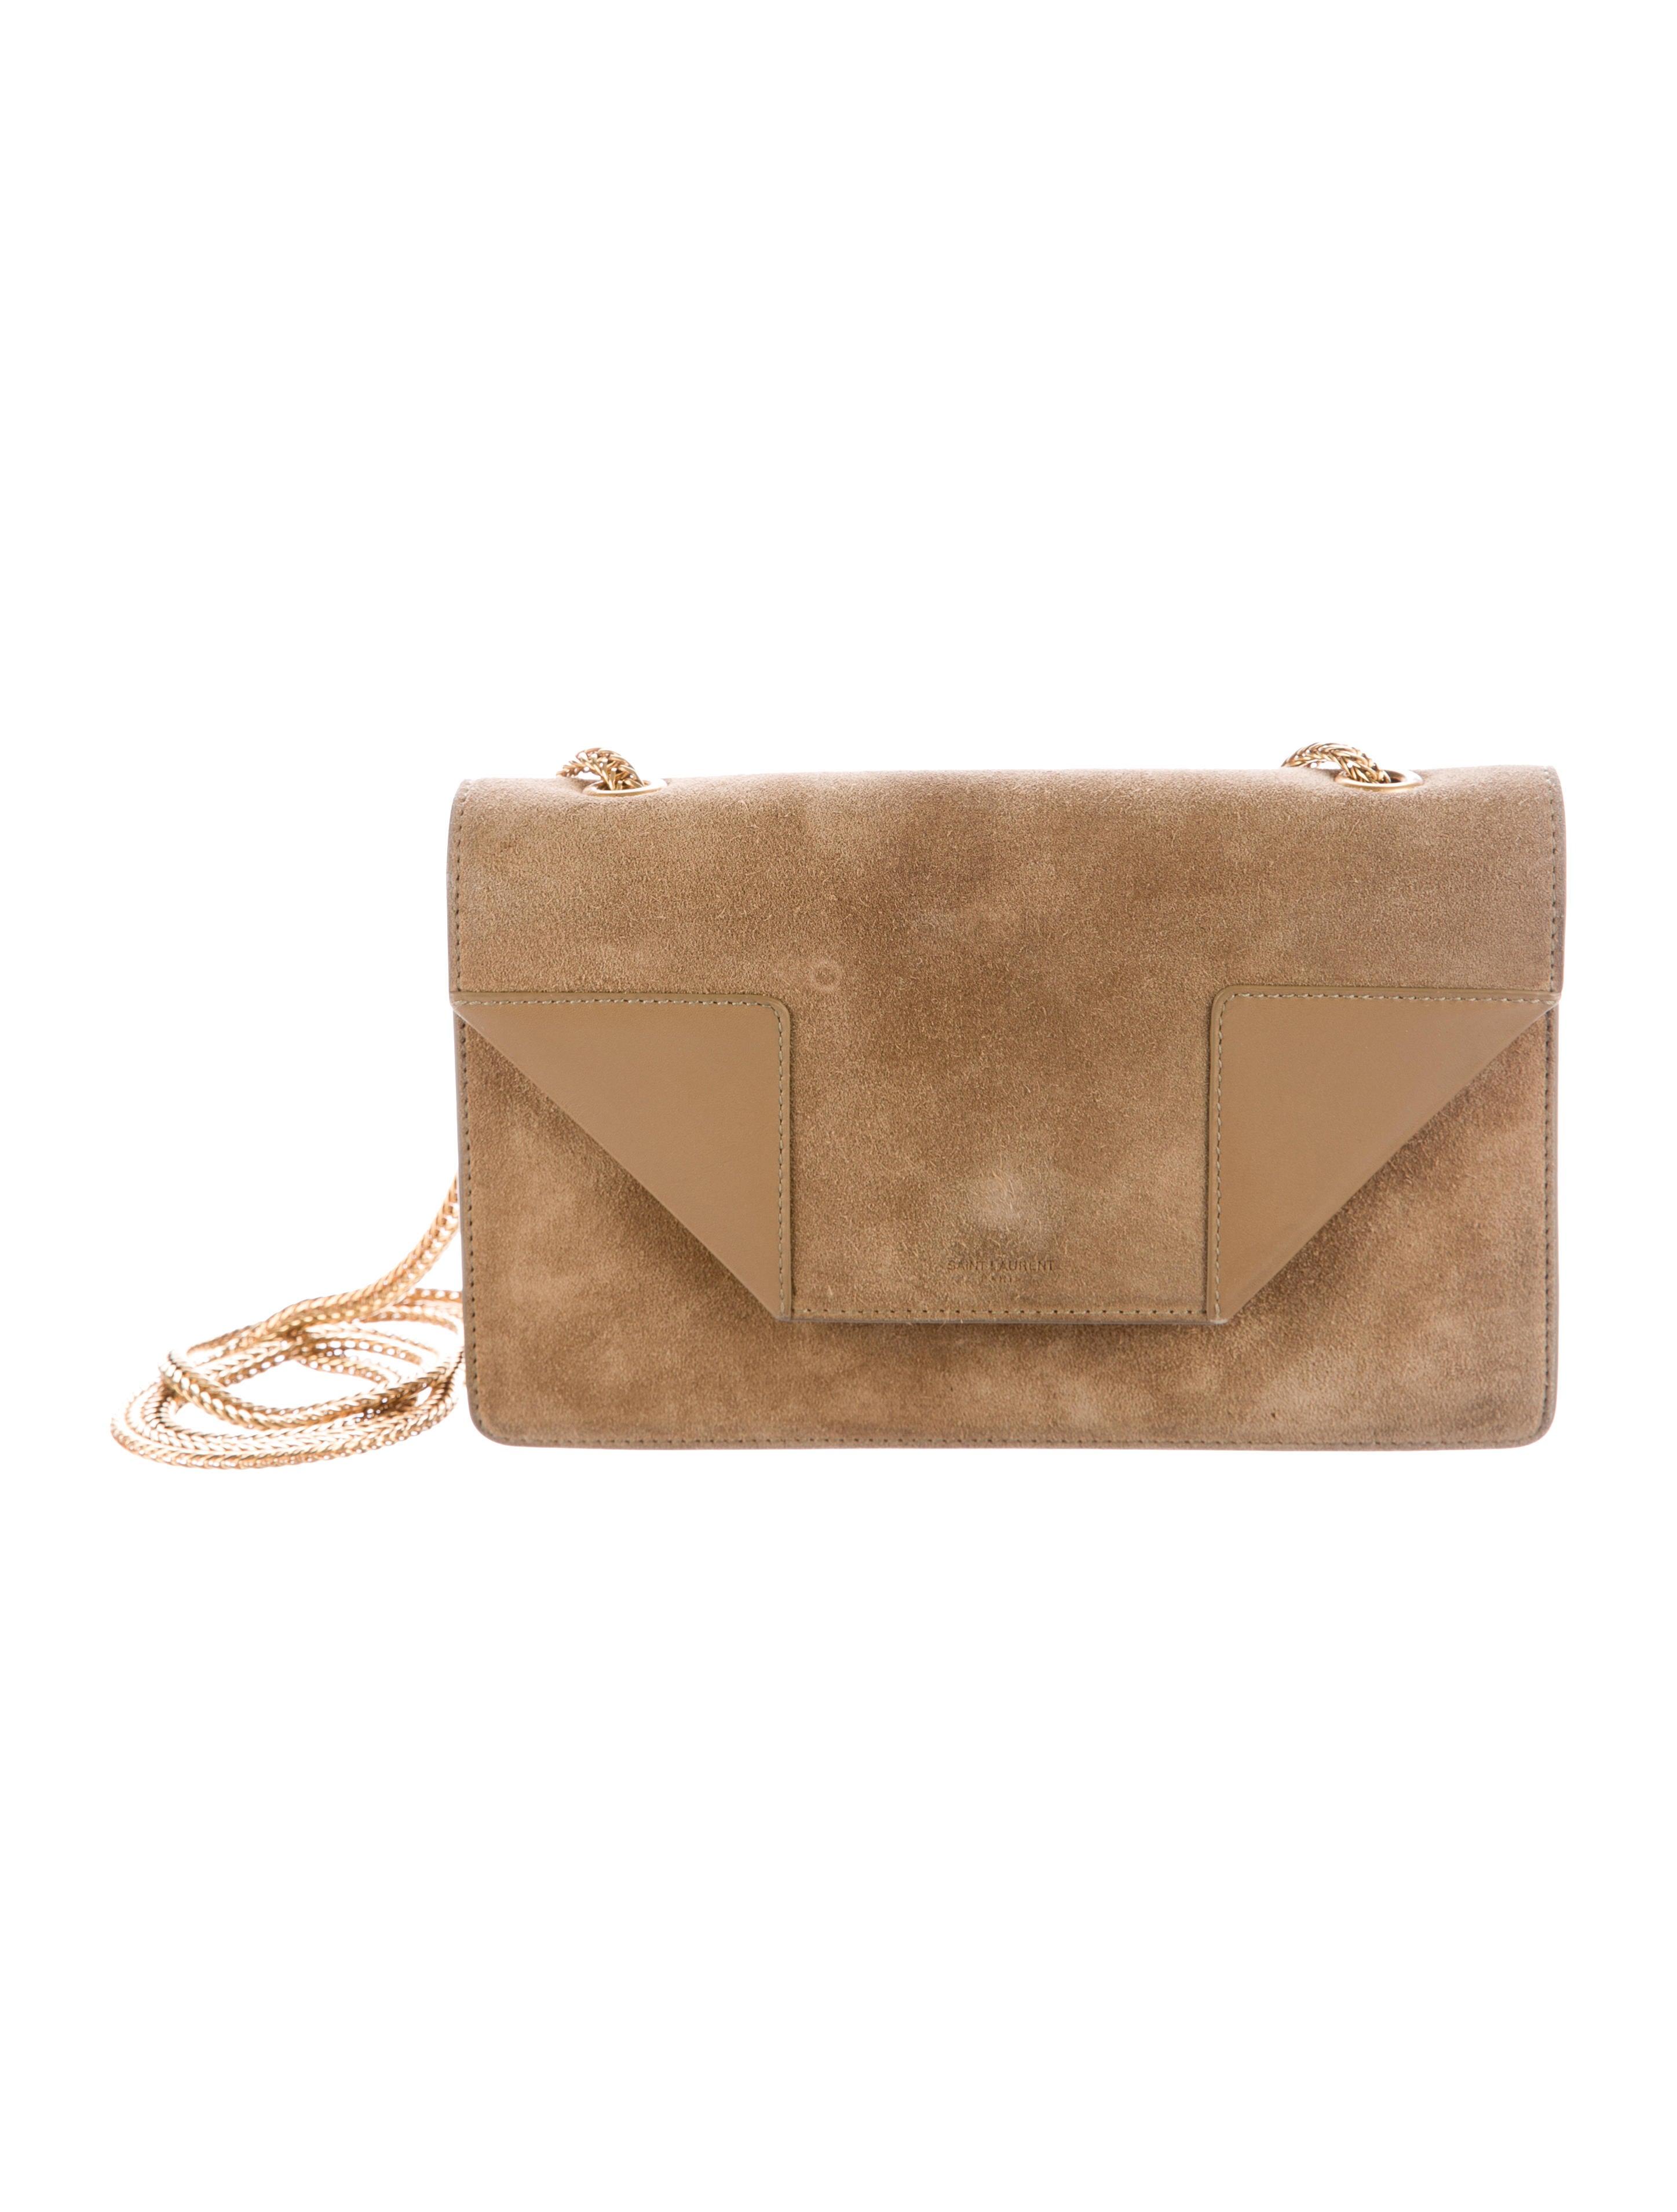 Saint Laurent Betty Mini Chain Suede Shoulder Bag - Travel Diaper Bag f44322e116534